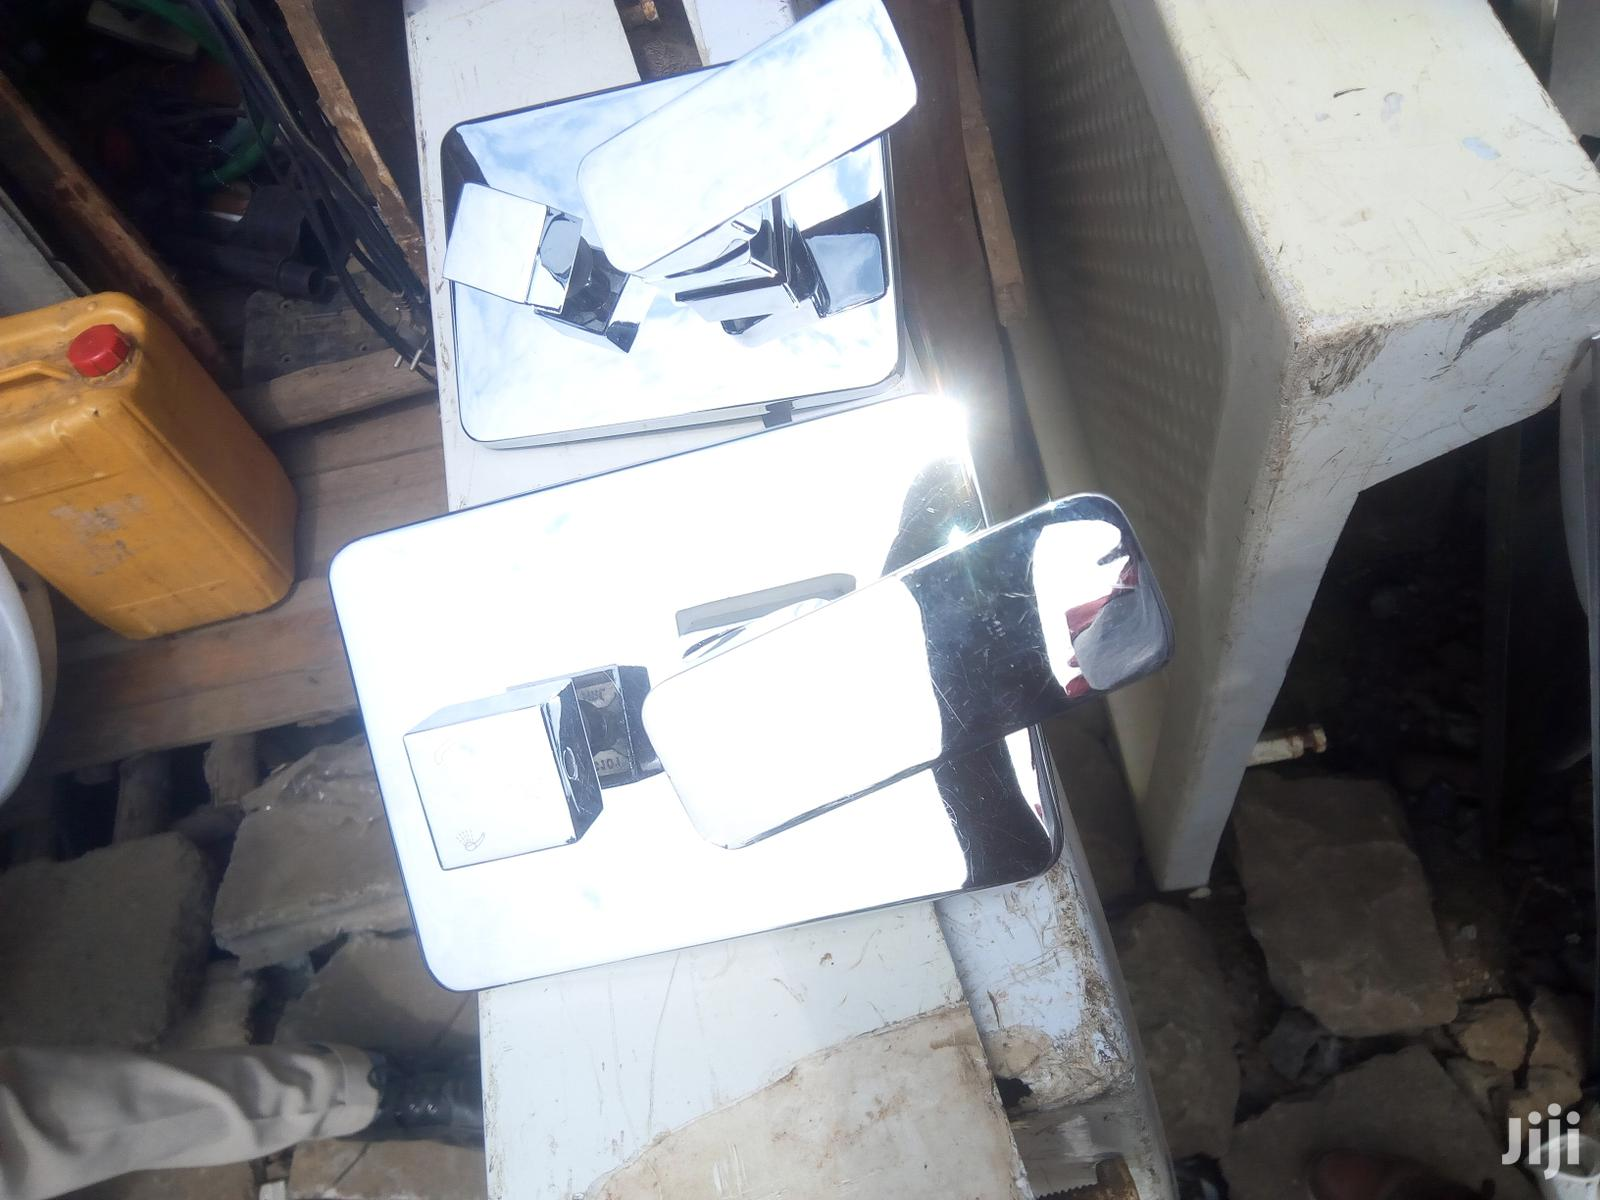 4-way Shower Mixers | Plumbing & Water Supply for sale in Nairobi Central, Nairobi, Kenya